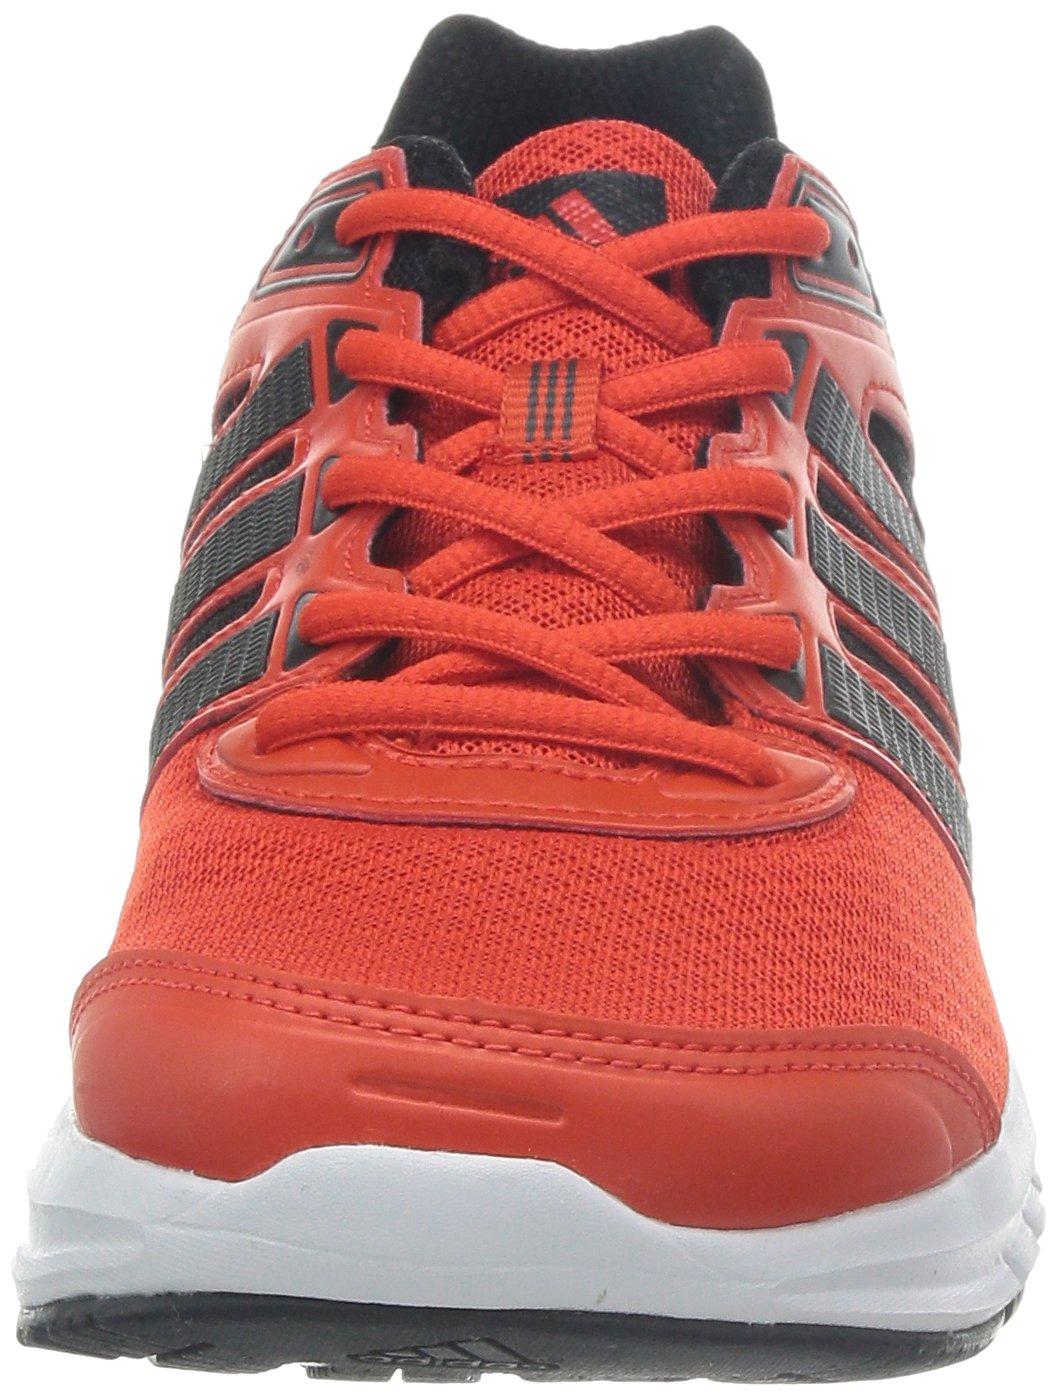 Amazon.com: adidas Duramo 6 Trainers - Mens - Orange/Black - UK Shoe Size 11: Sports & Outdoors